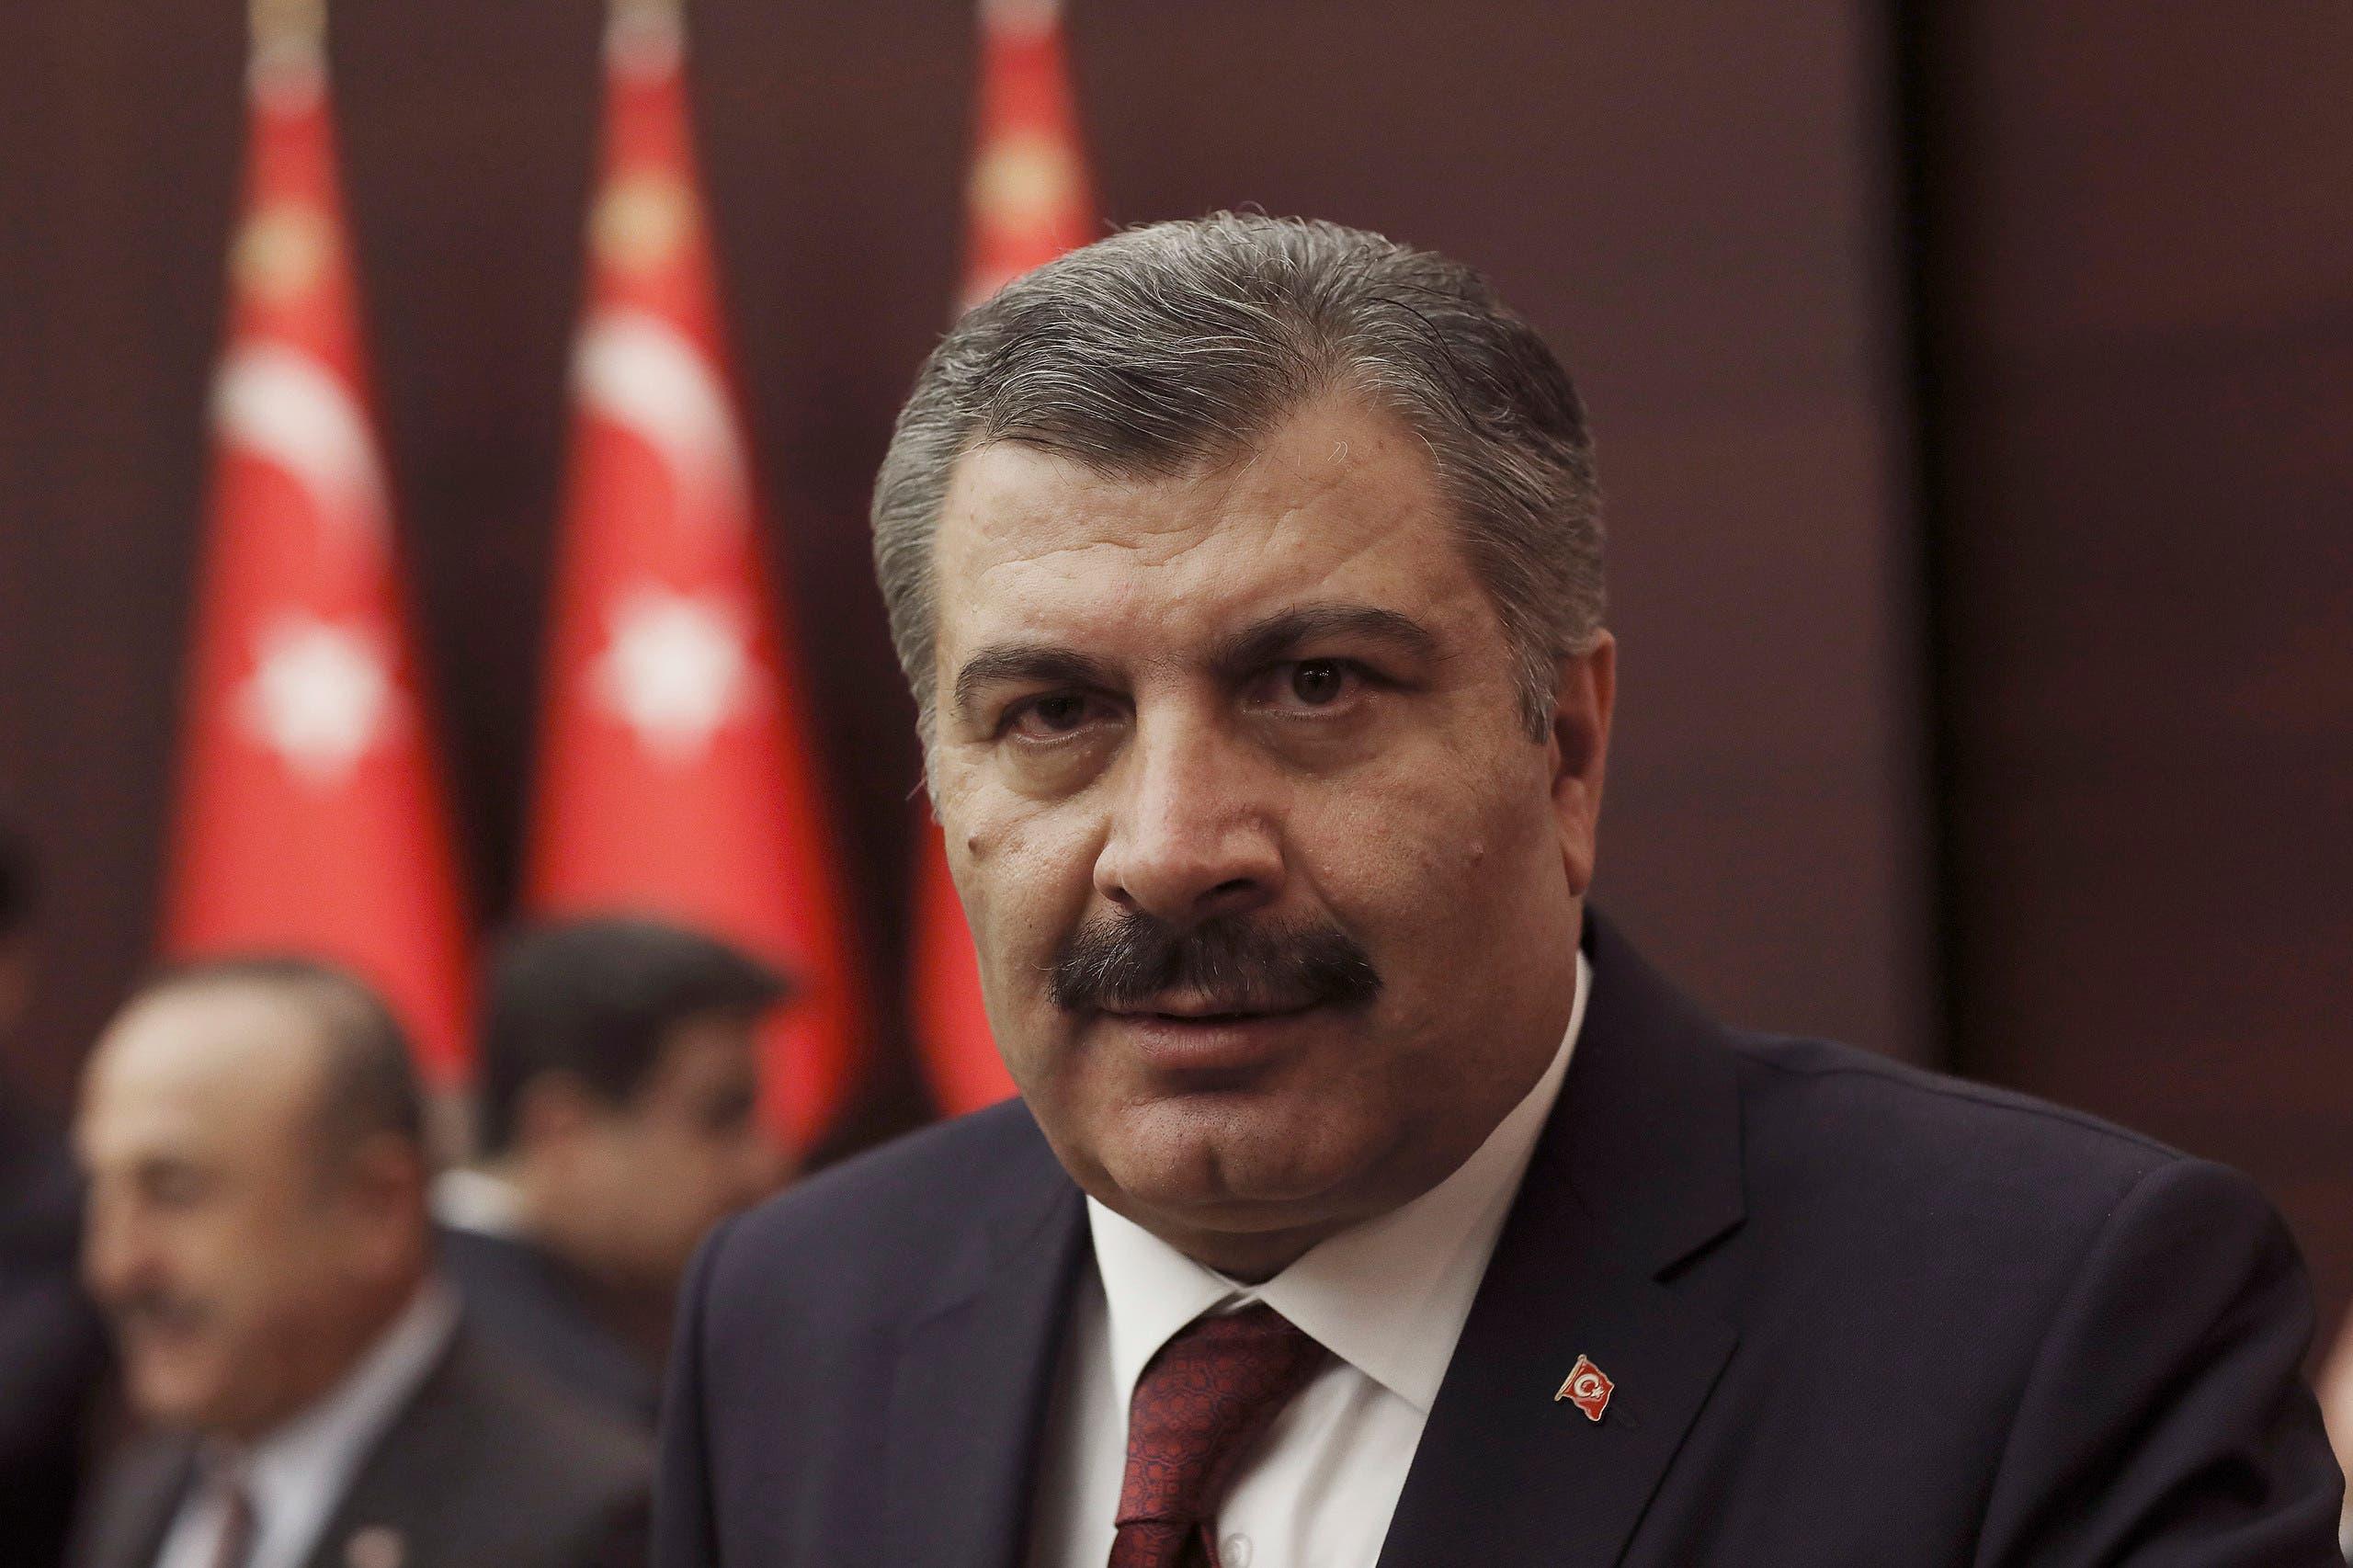 Turkey's Health Minister Fahrettin Koca speaks to journalists after a meeting on the new coronavirus in Ankara, Turkey. (File photo: AP)